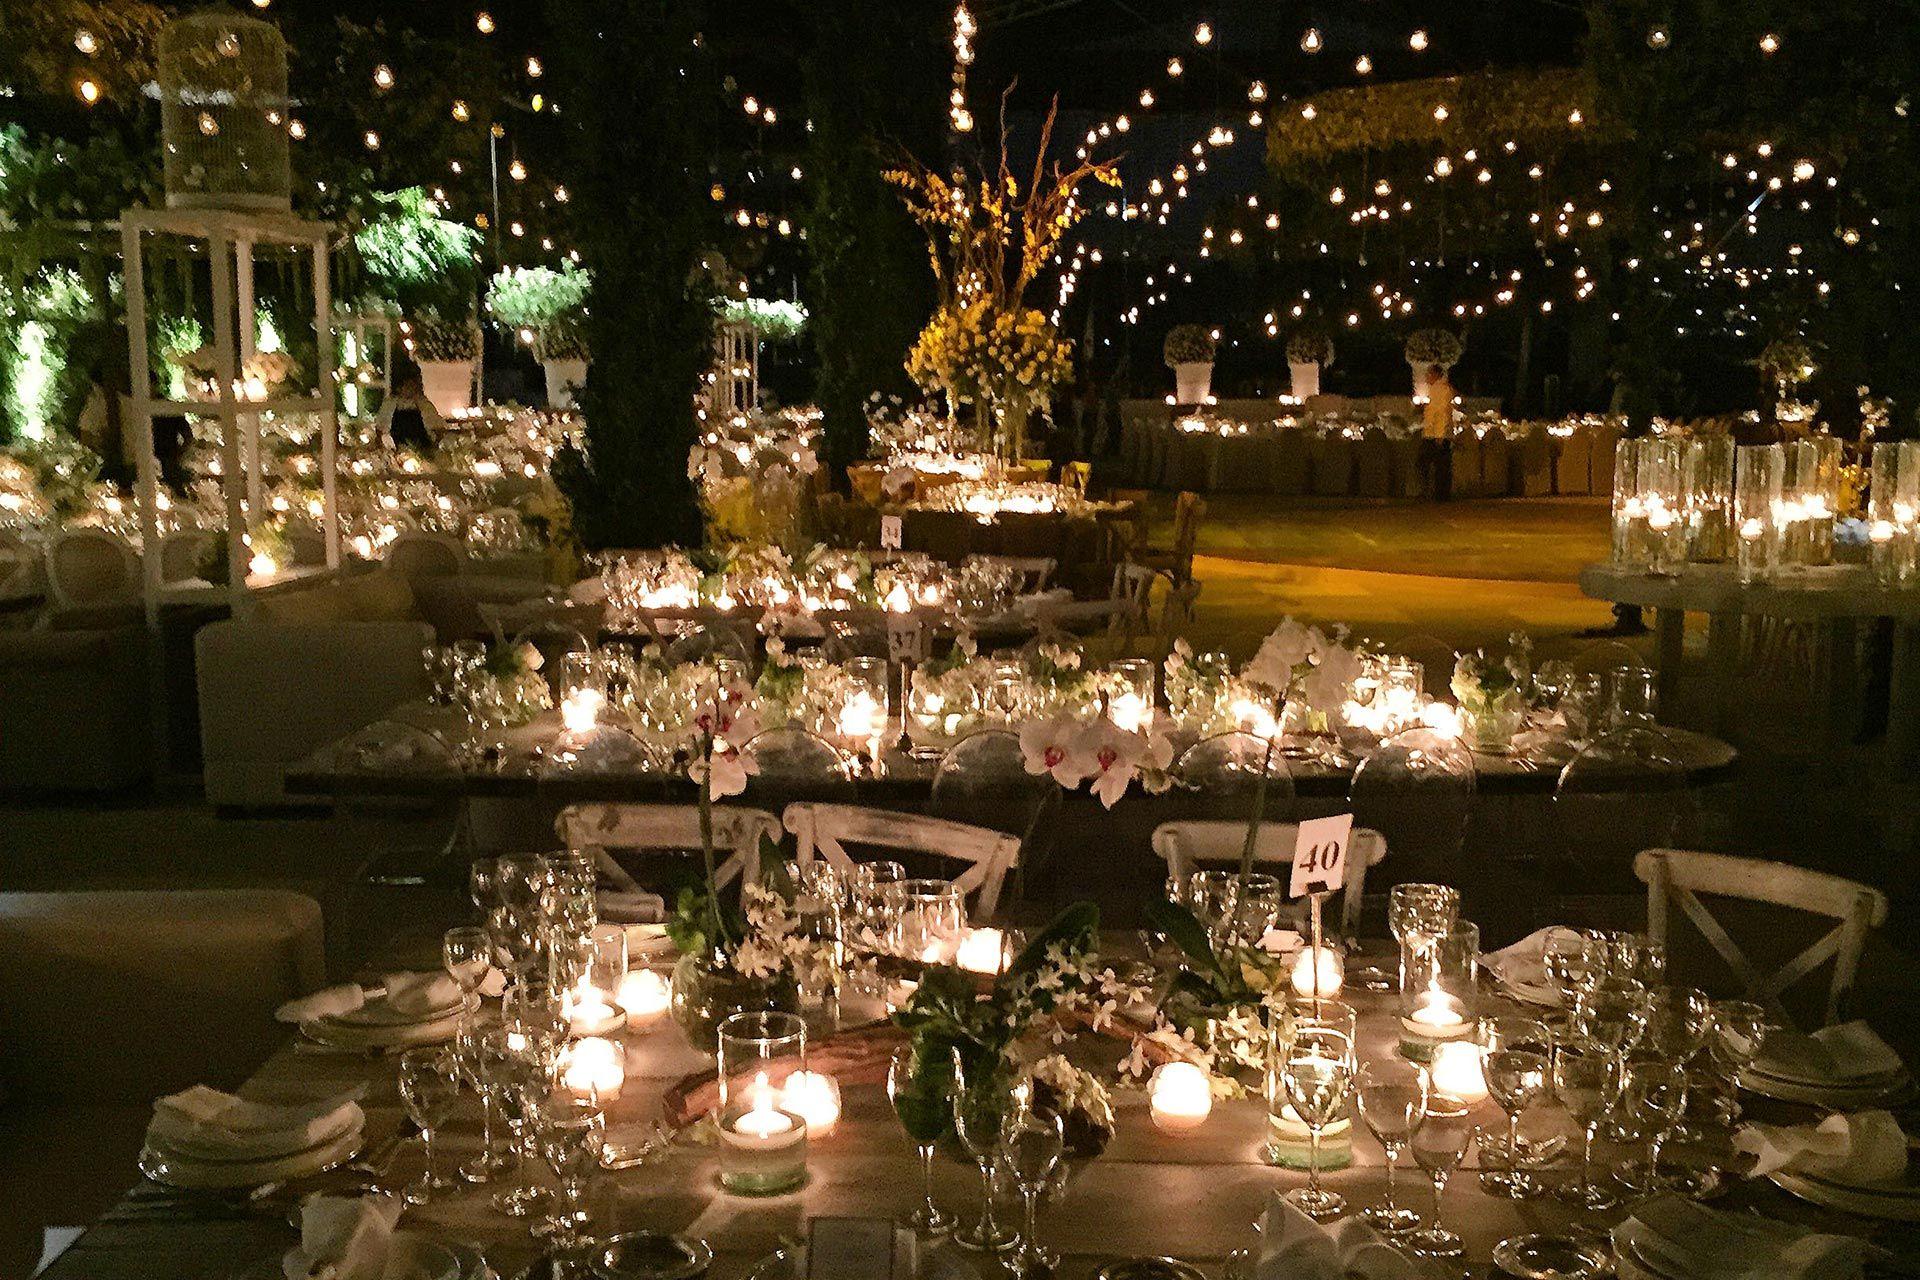 Peter de anda wedding planner bodorrio pinterest for Decoracion fiesta jardin noche